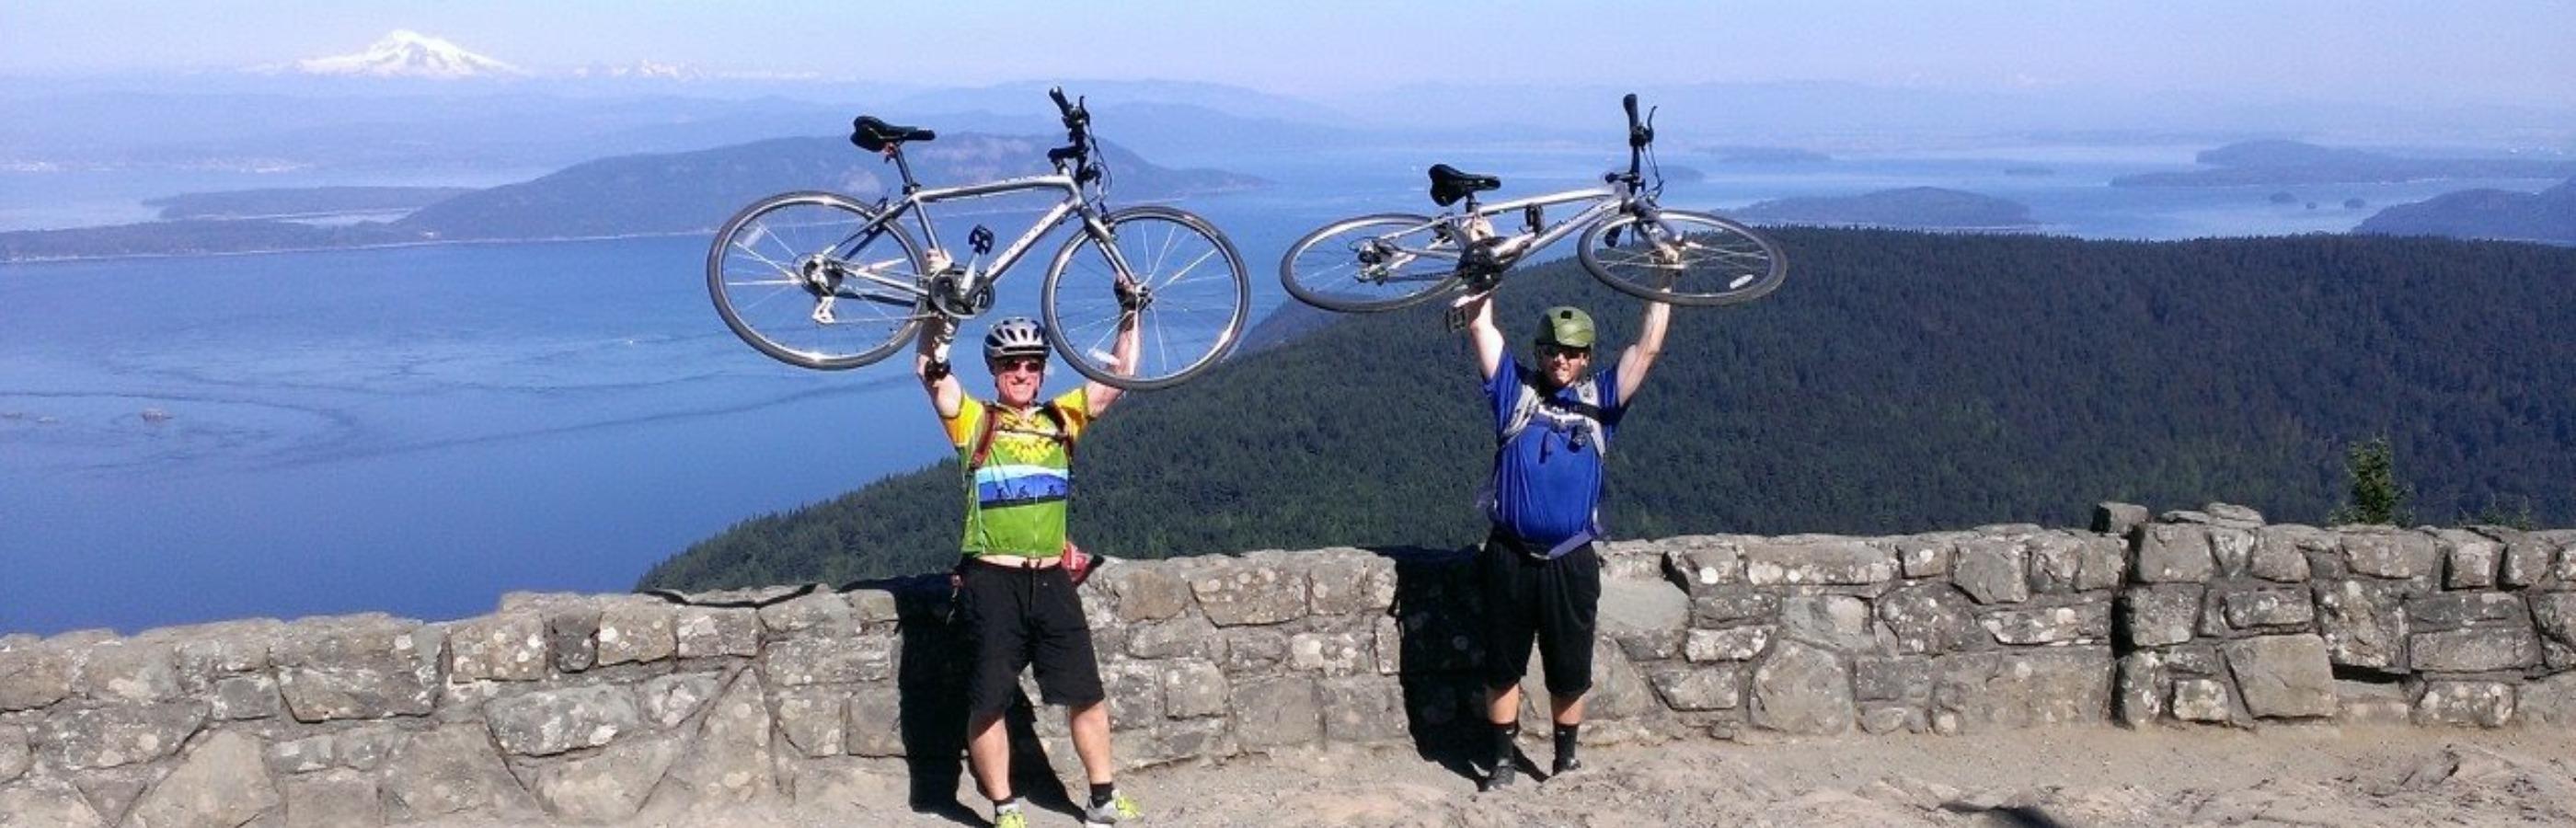 bike trips in the San Juan Islands and Orcas Island